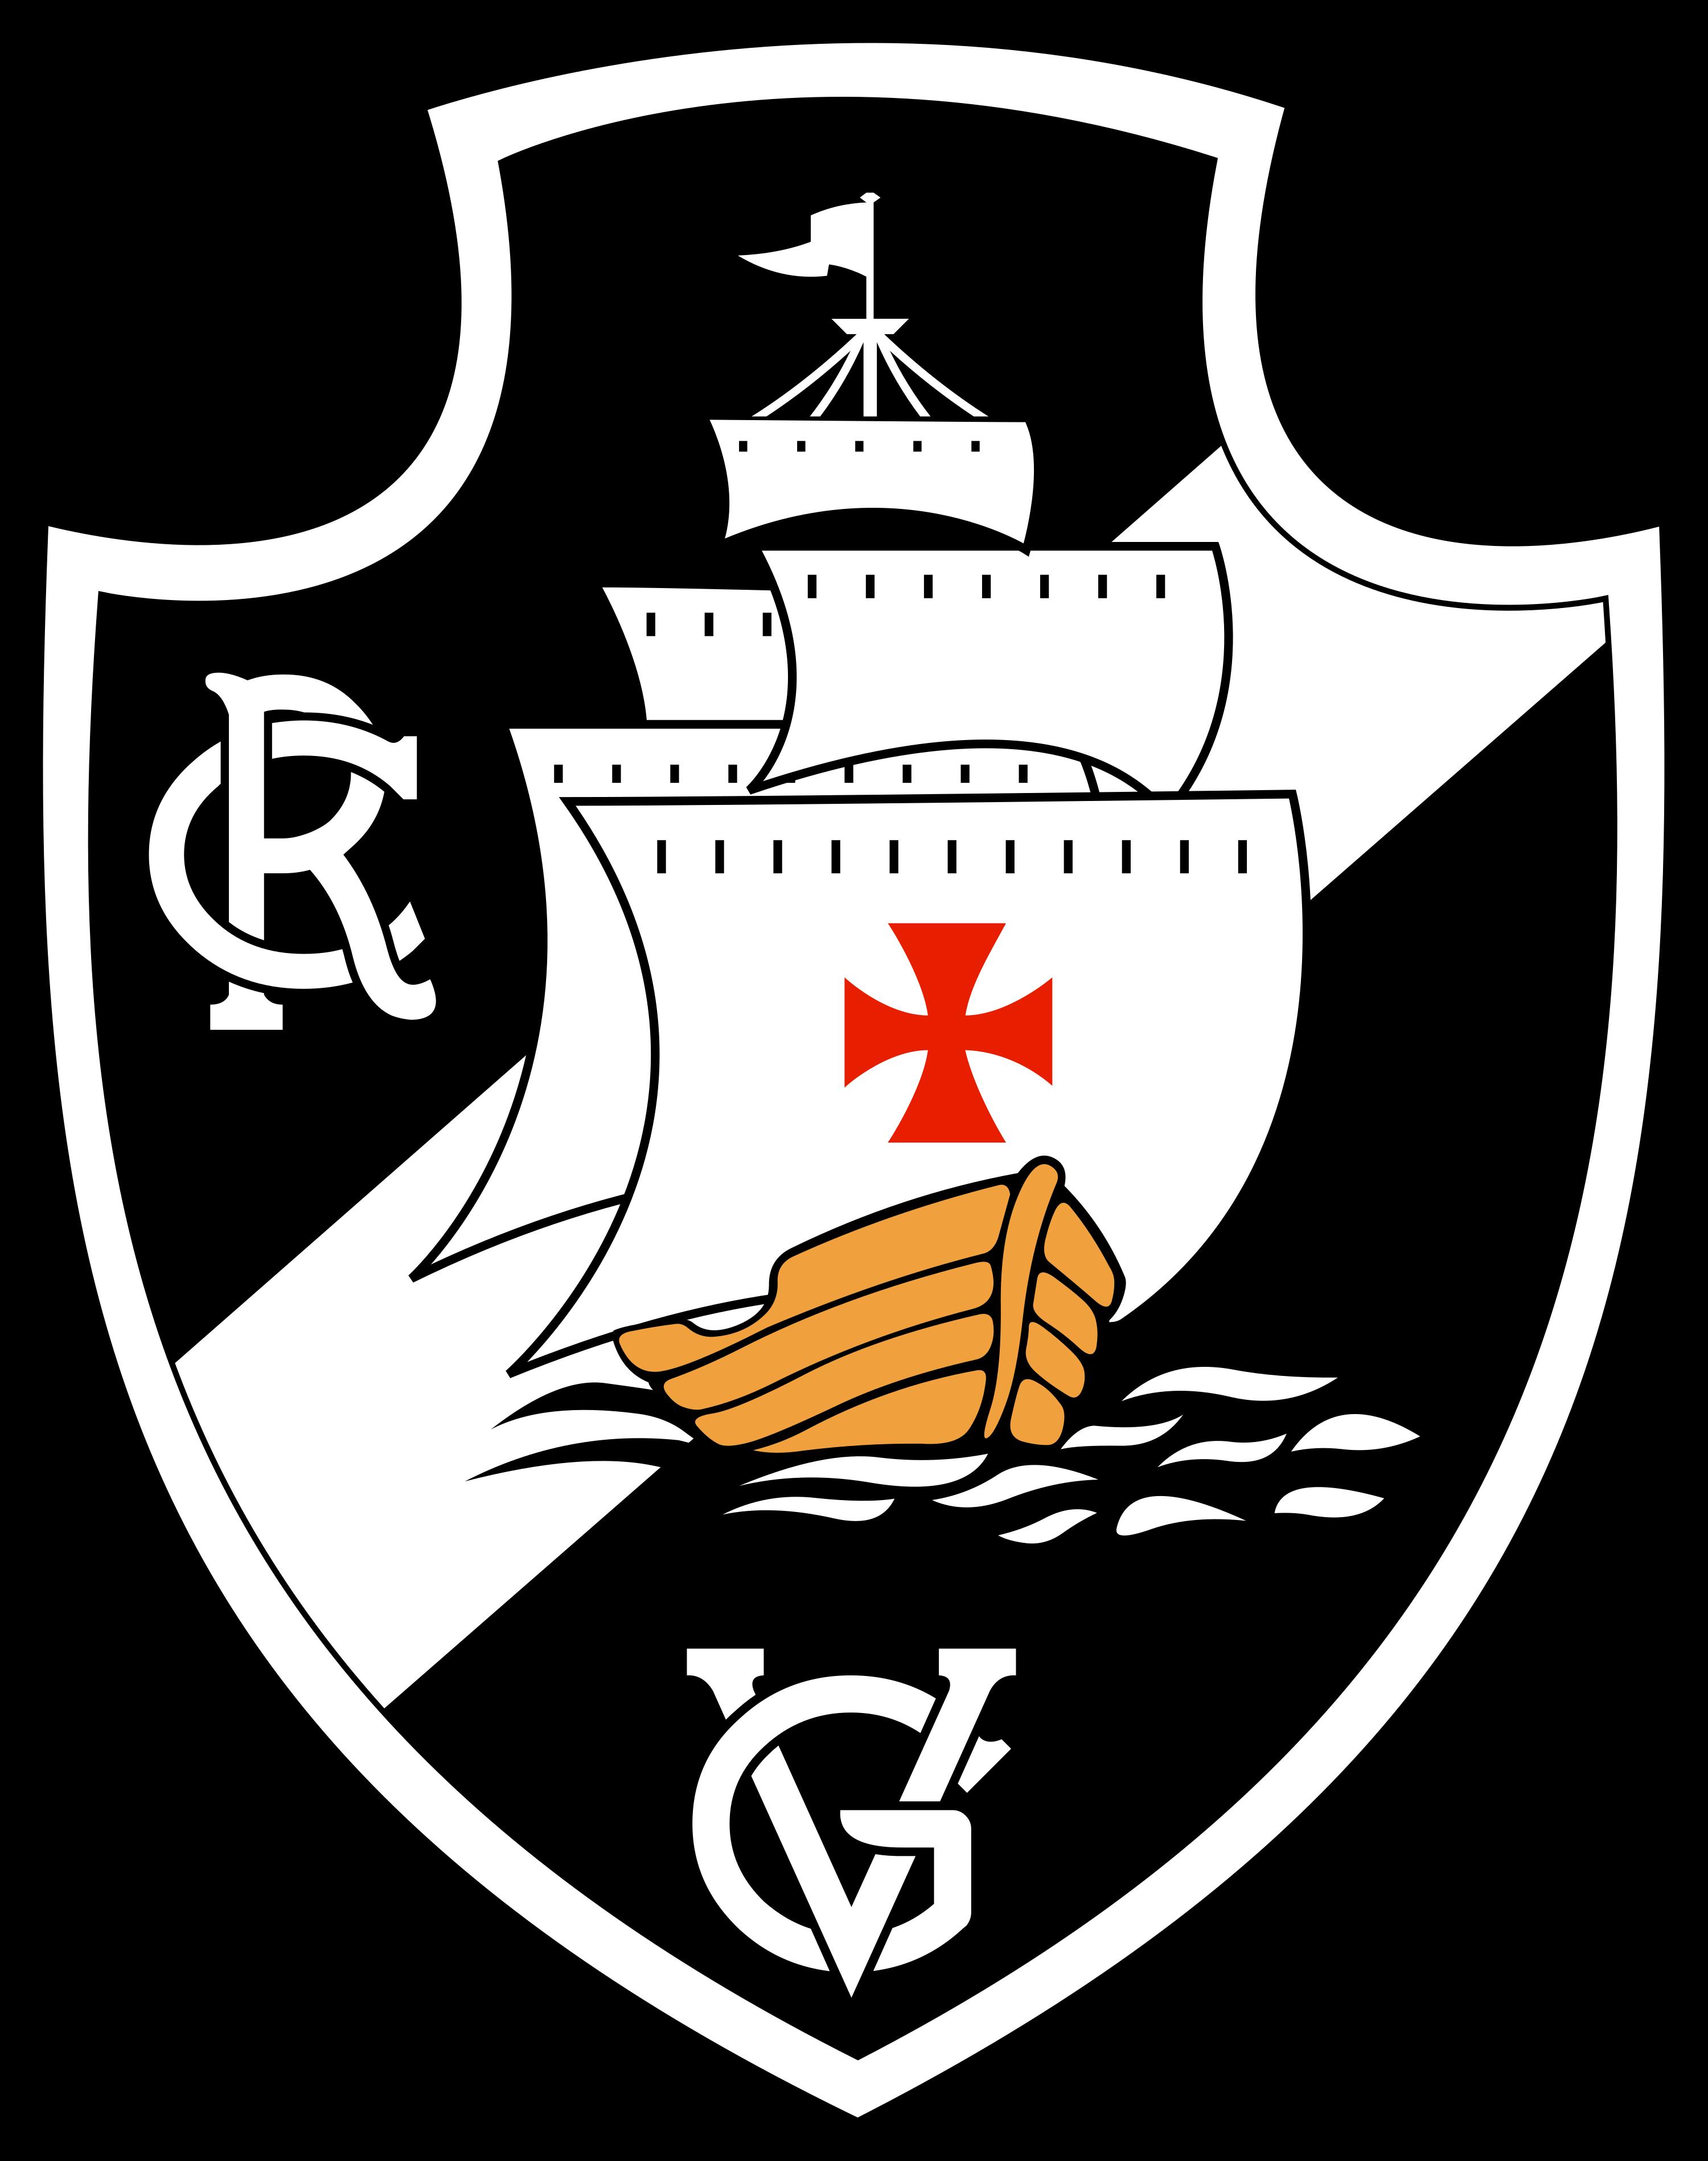 vasco logo escudo 2 - Vasco da Gama Logo